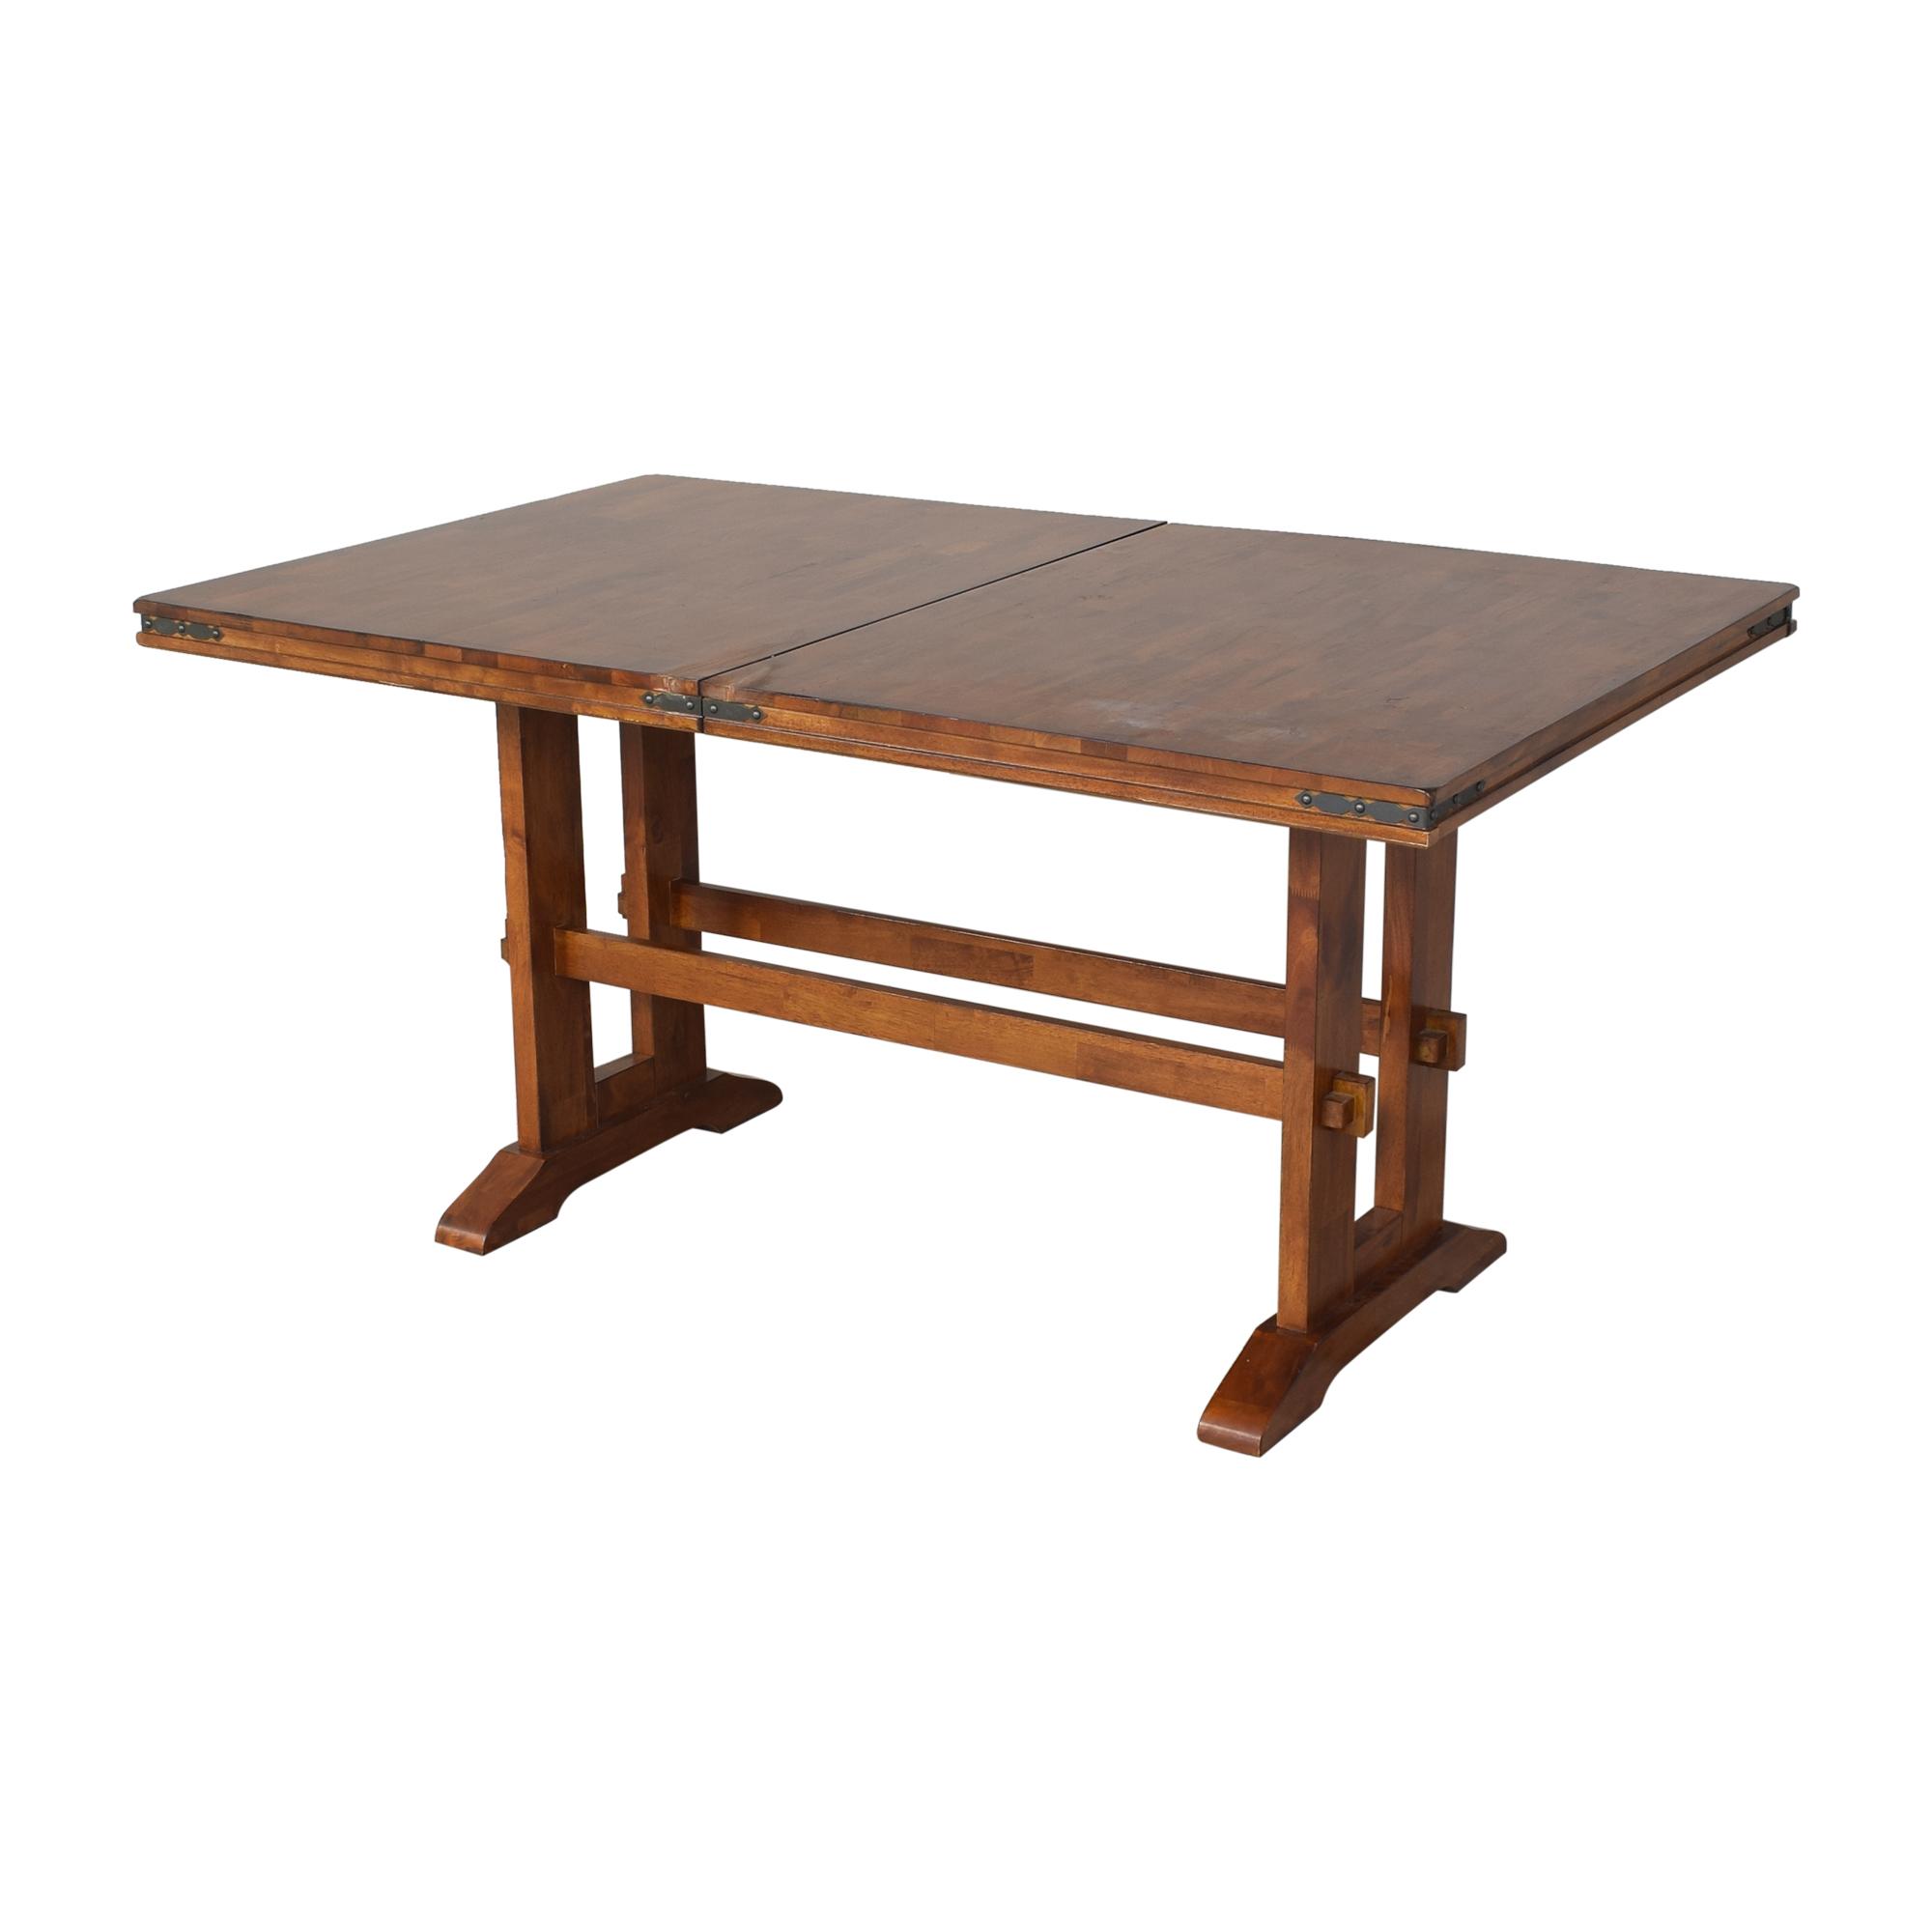 Lenox Lenox Extendable Dining Table ma